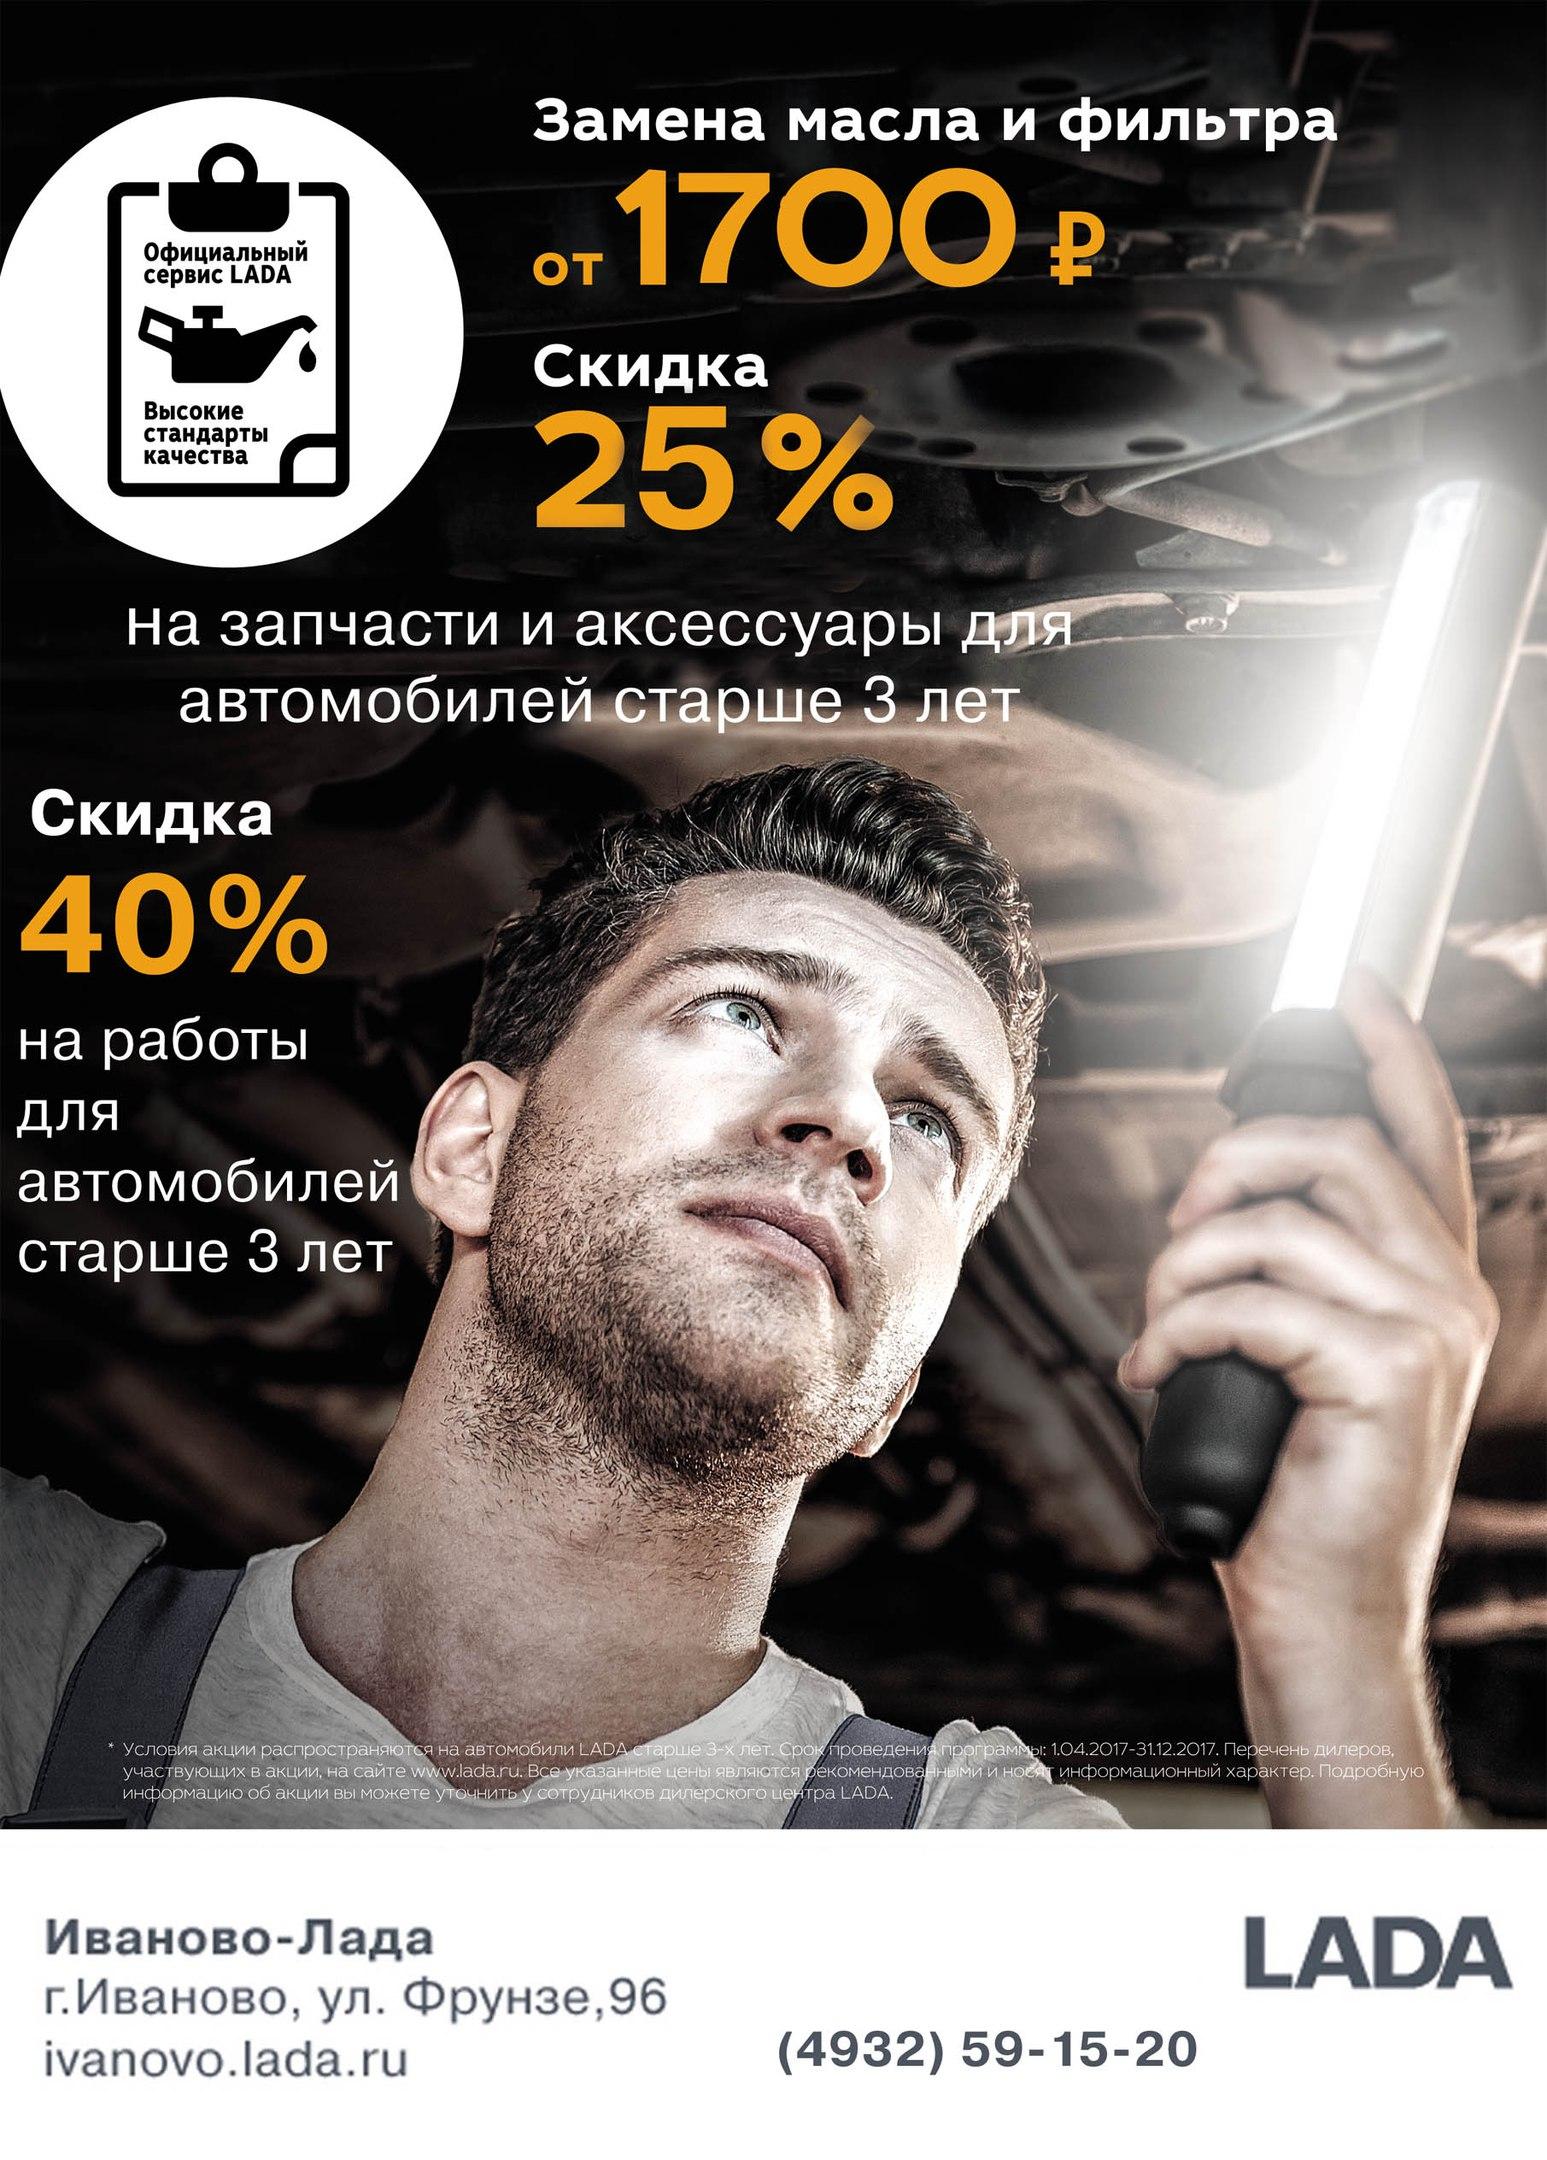 Замена масла и фильтра от 1700 рублей